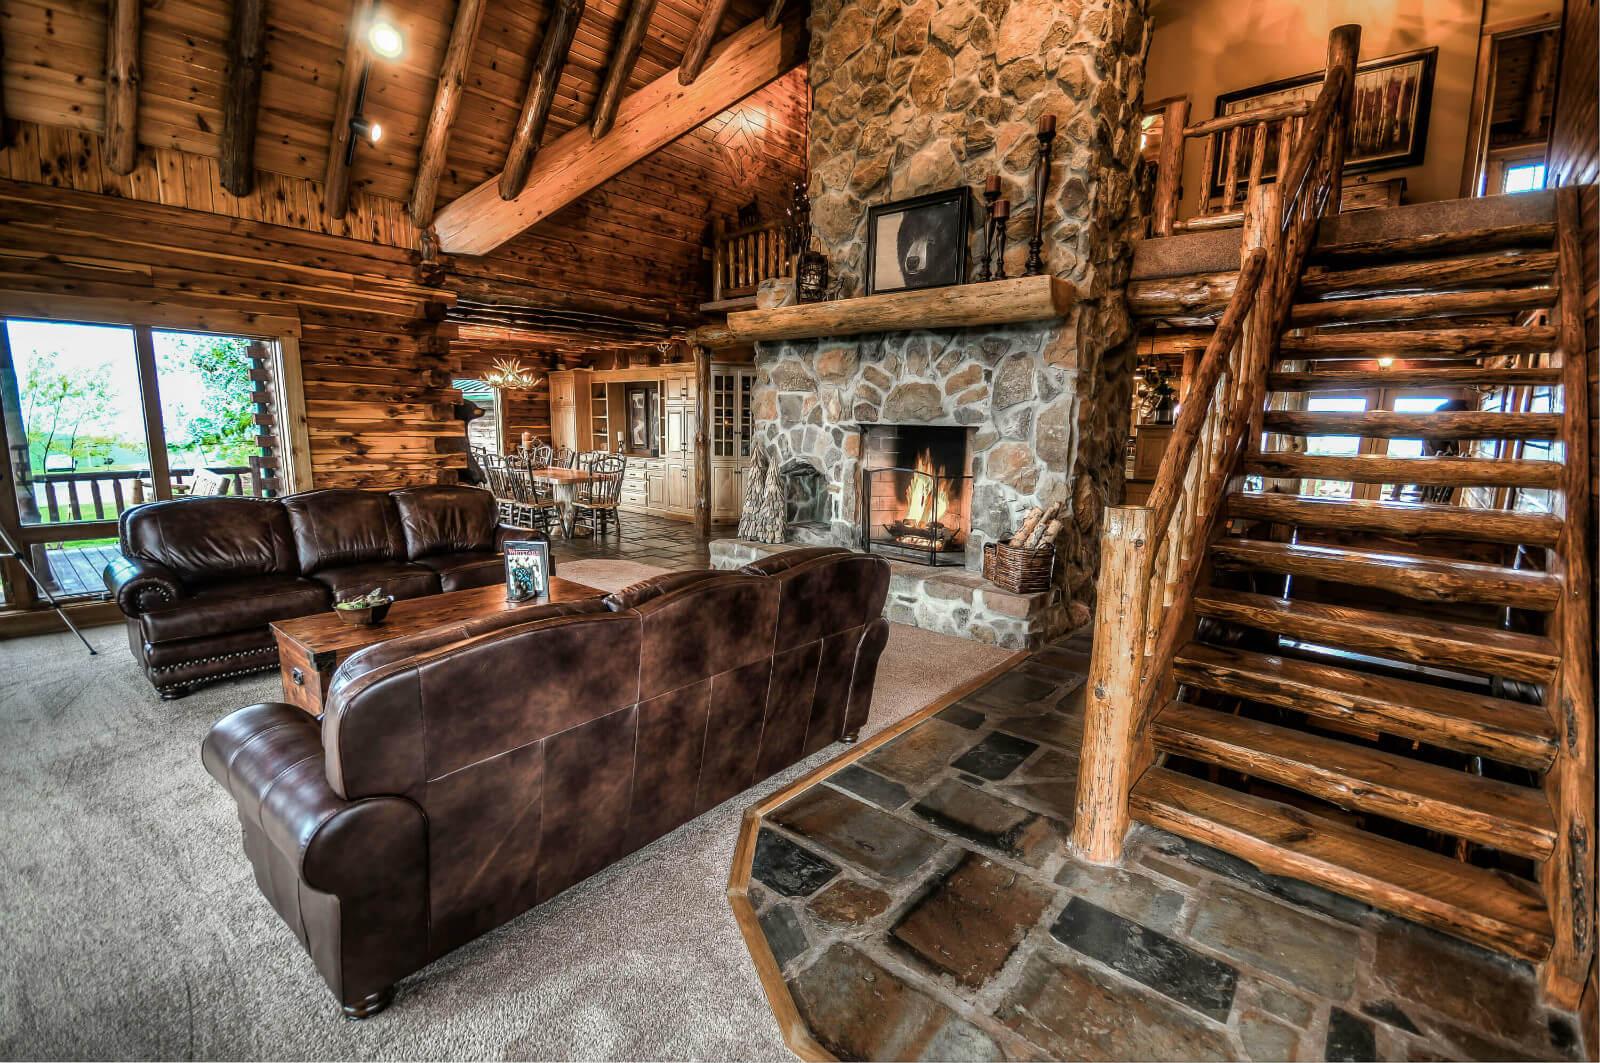 Coshocton Crest Lodge Cabin Rental Area Attractions Ohio